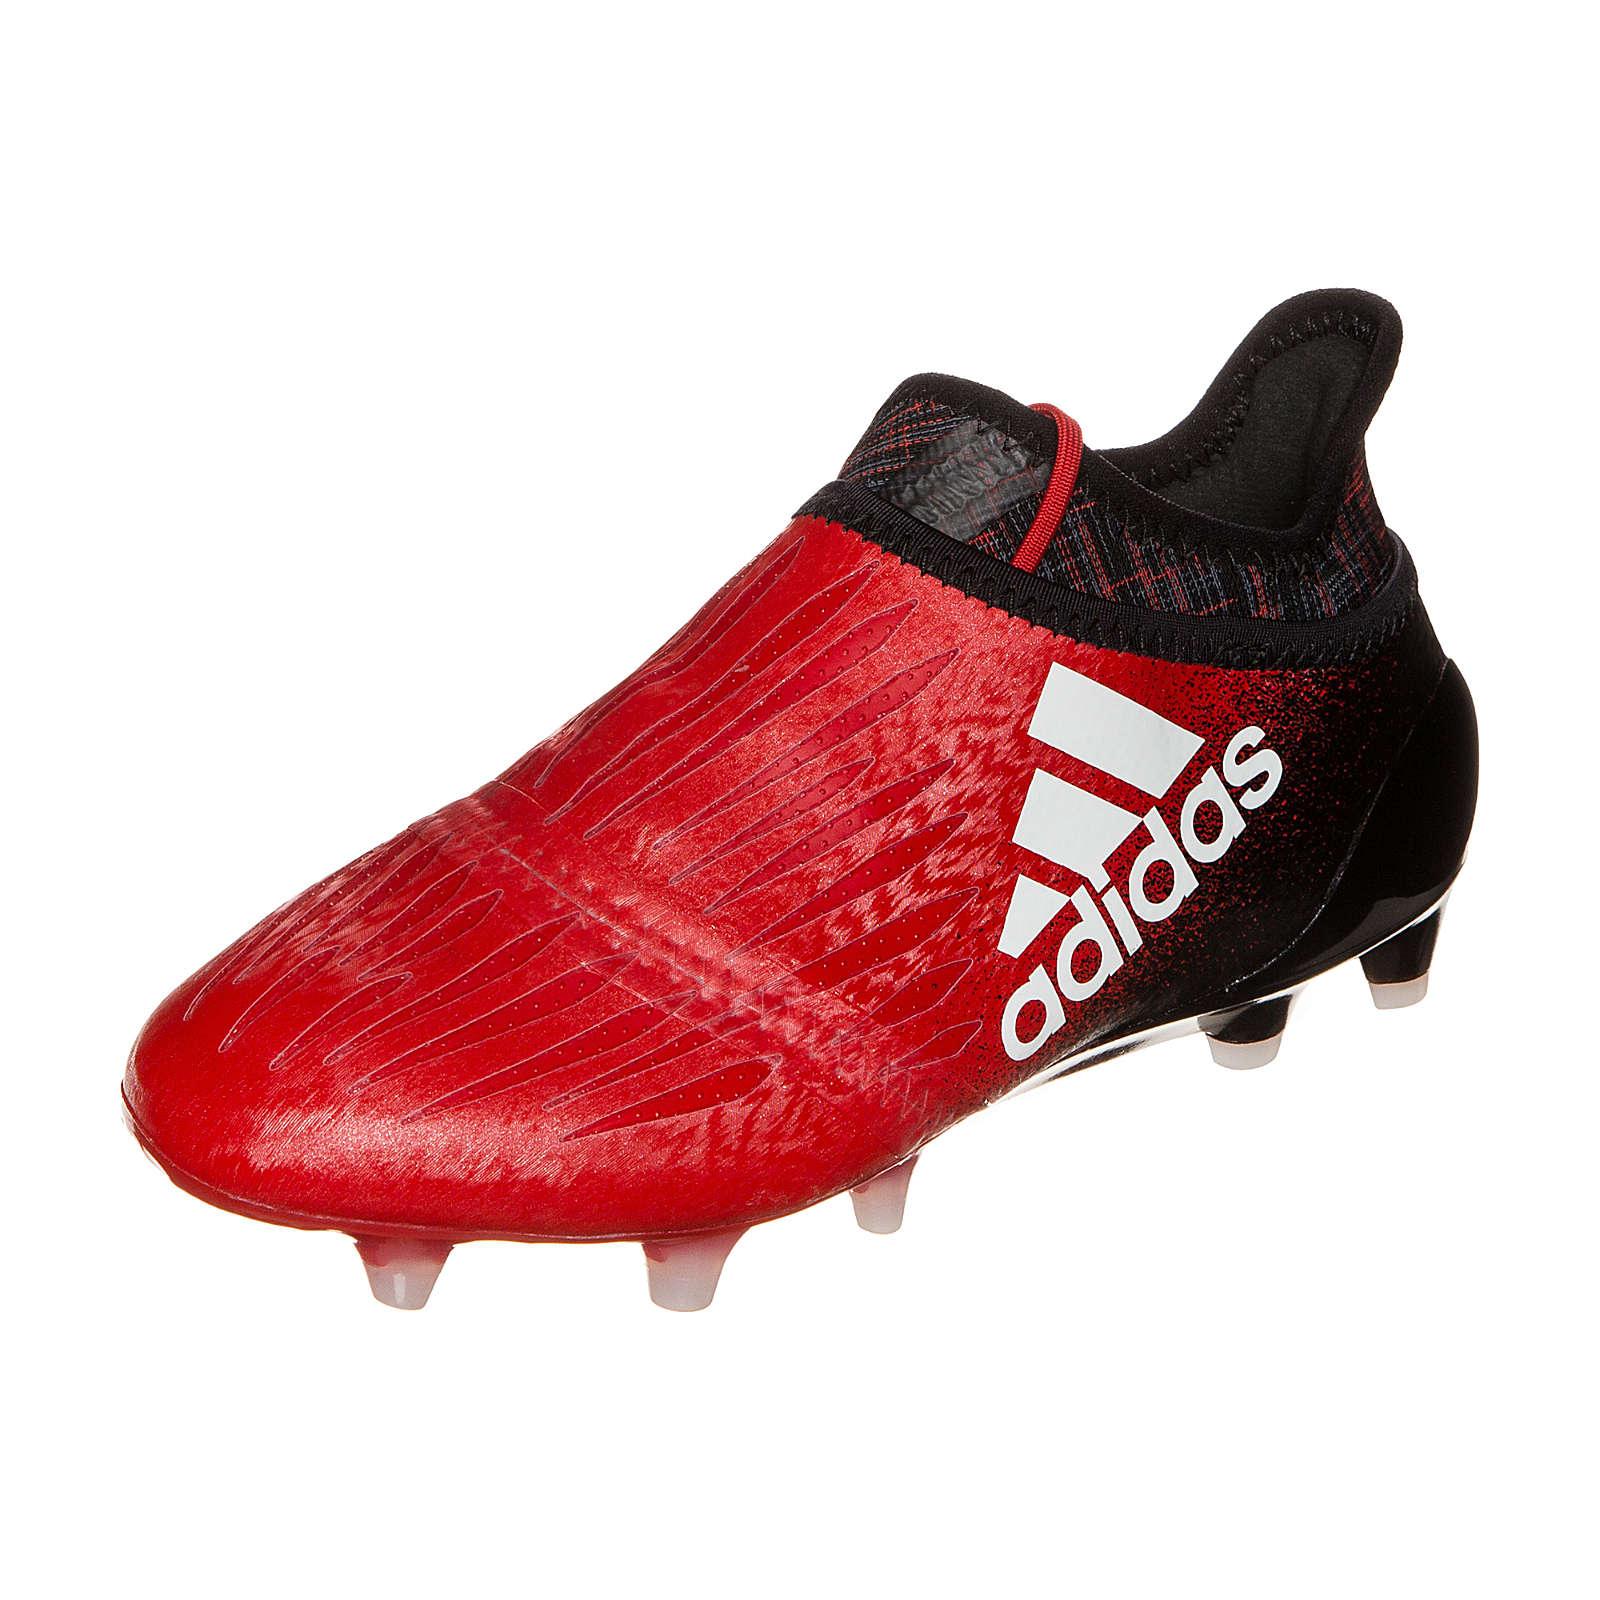 adidas Performance Kinder Fußballschuhe X 16+ Gr. 37 1/3 jetztbilligerkaufen